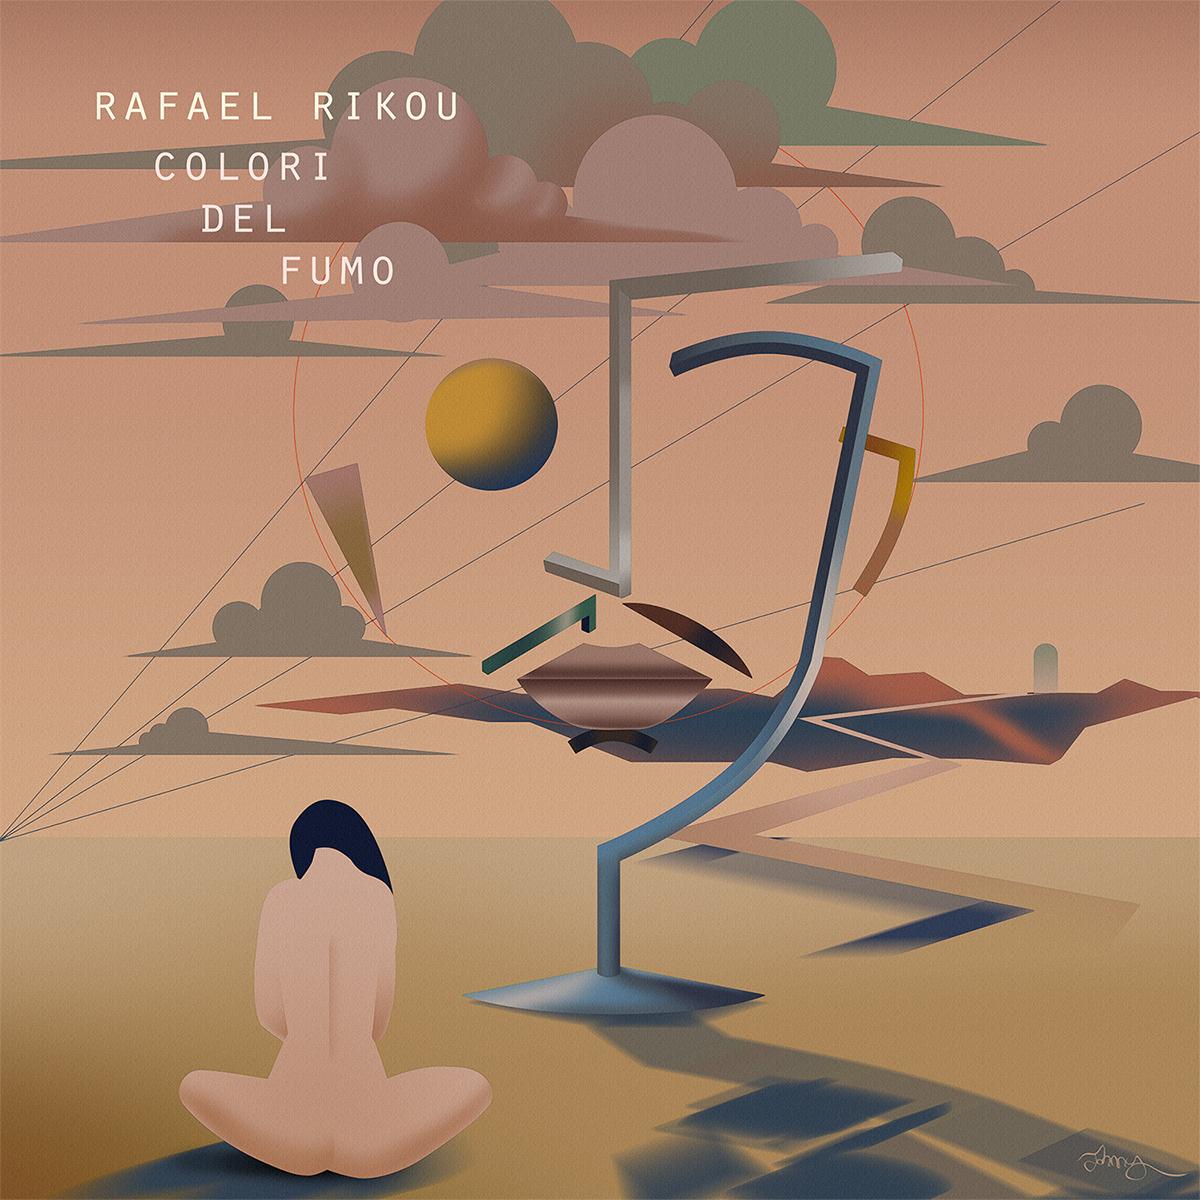 Rafael Rikou – Colori Del Fumo